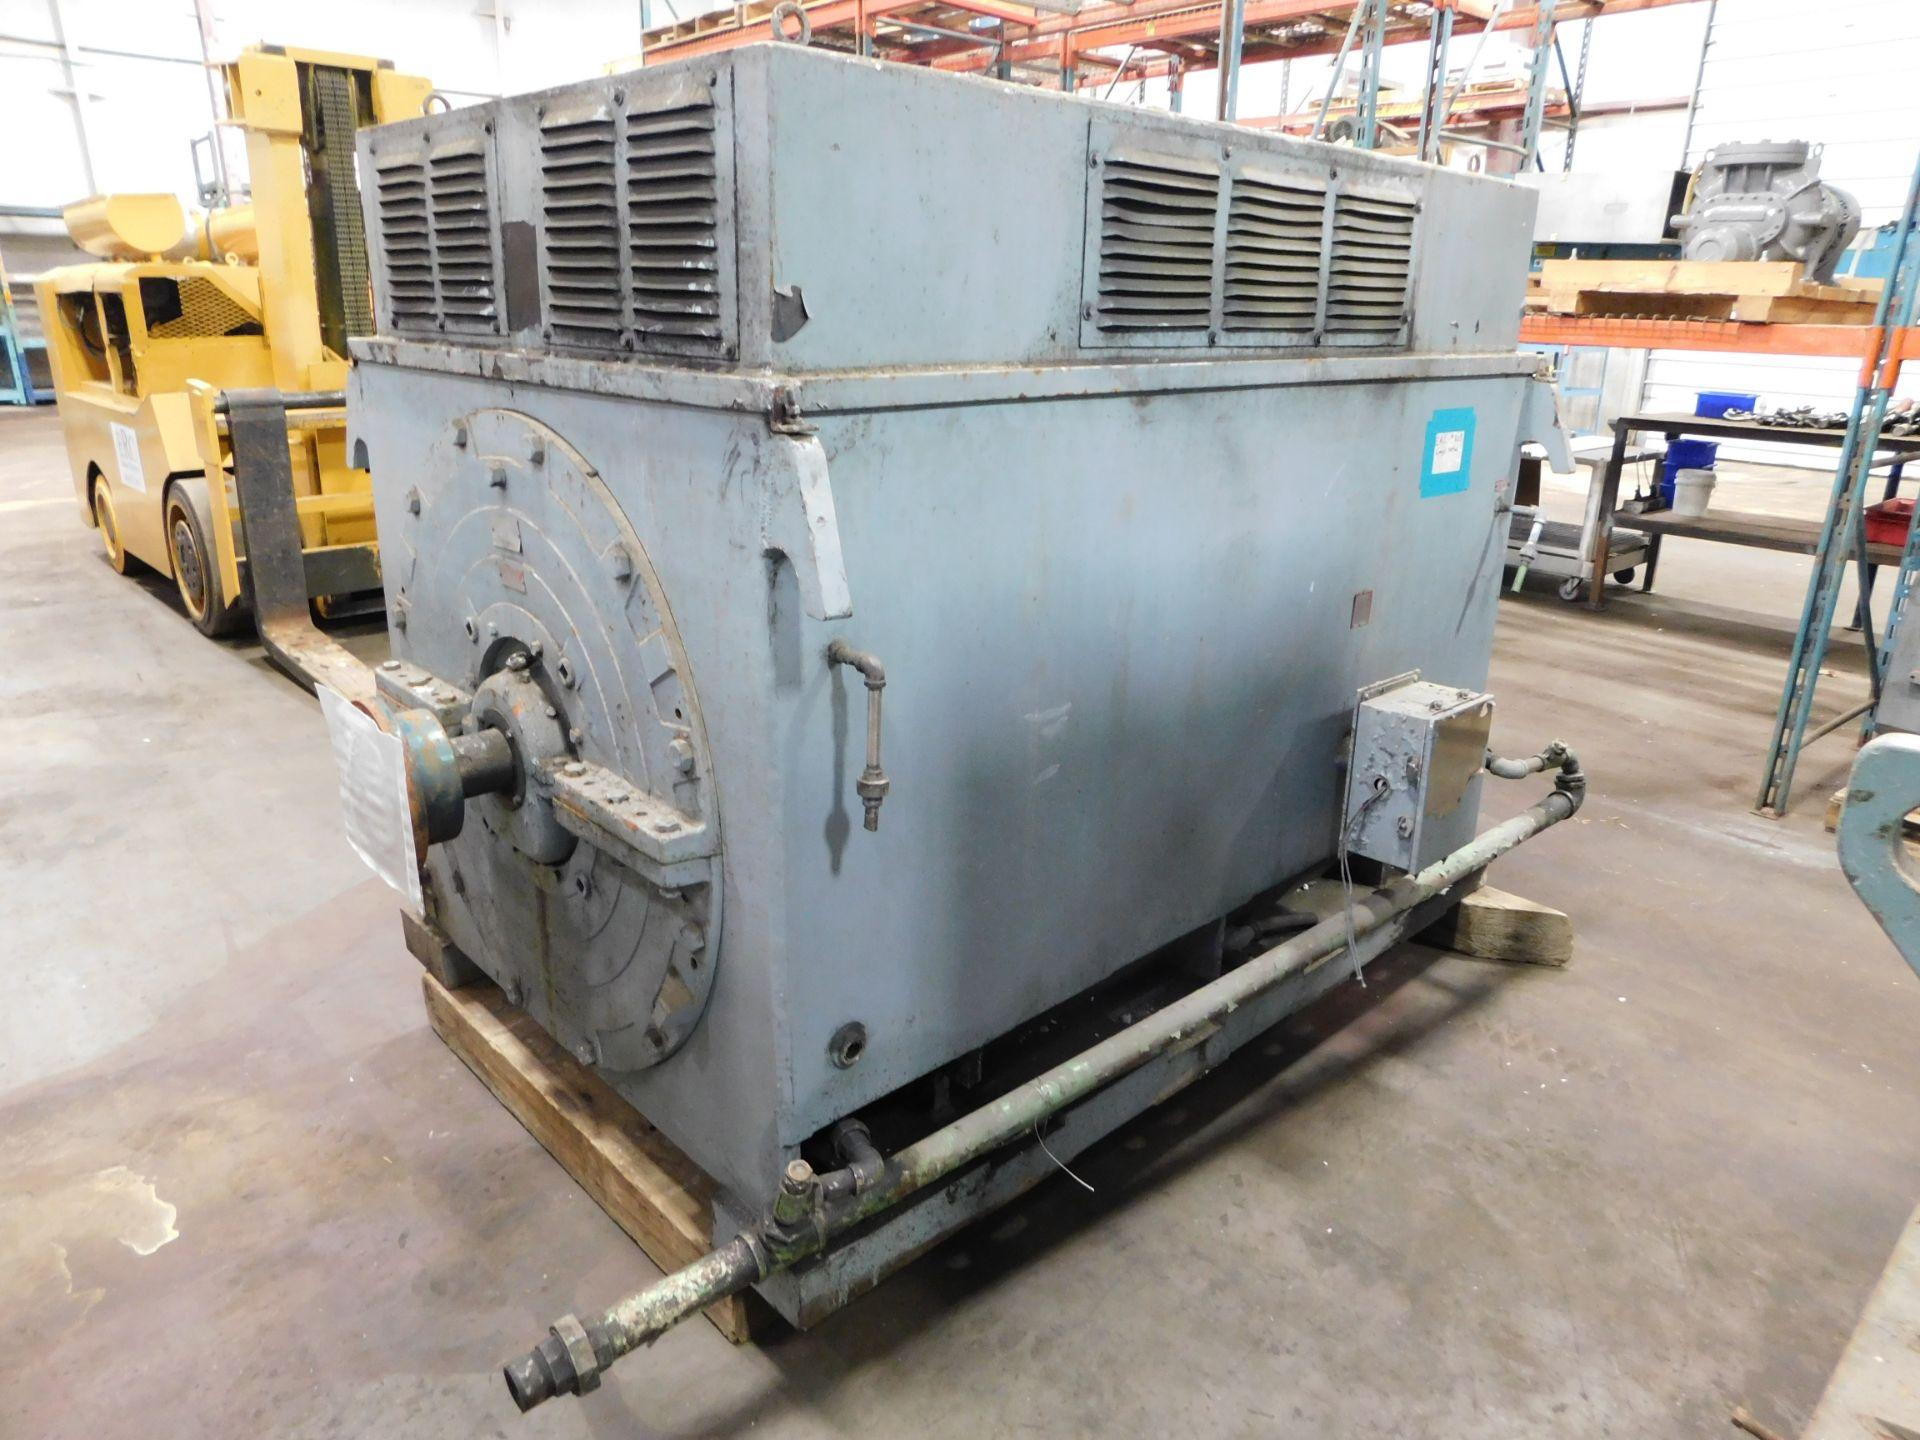 Louis Allis IPS Induction Motor. 2500 HP. 3 Ph. 4000 V. 3590 RPM. WP-1. 1000 SPC. - Image 3 of 5